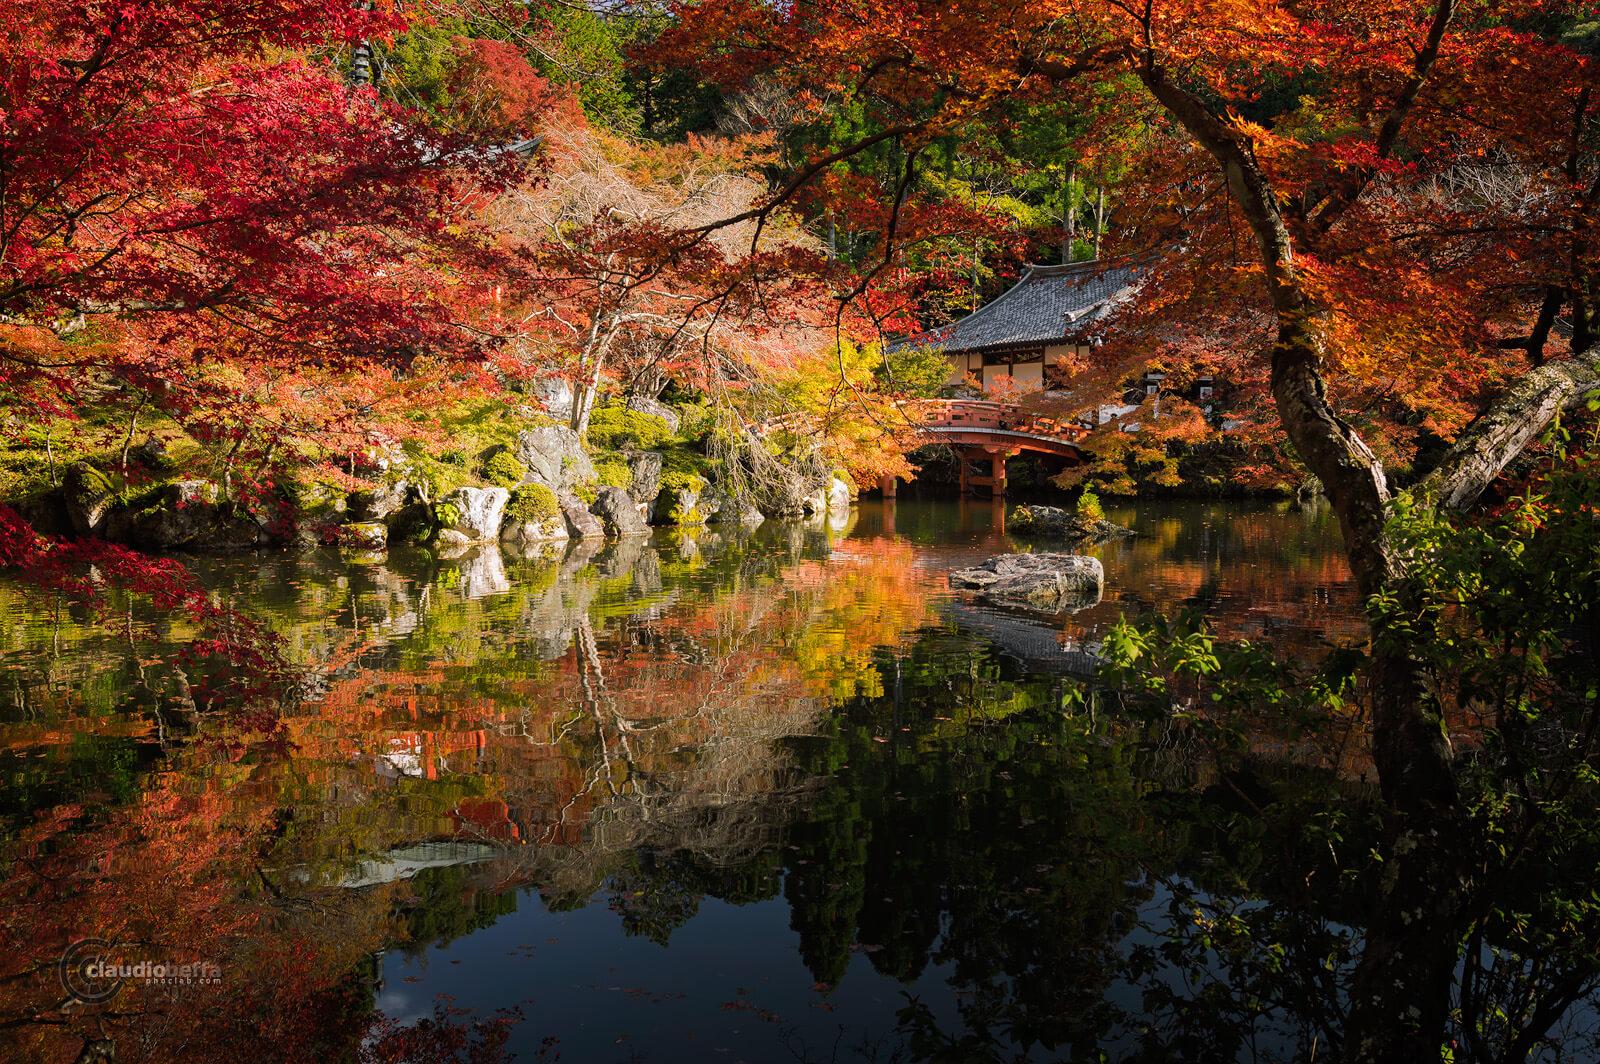 DaigoJi, Autumn, BentenDo, impressionist autumn, Kyoto, Japan, Momiji, Red, Pond, Phoclab